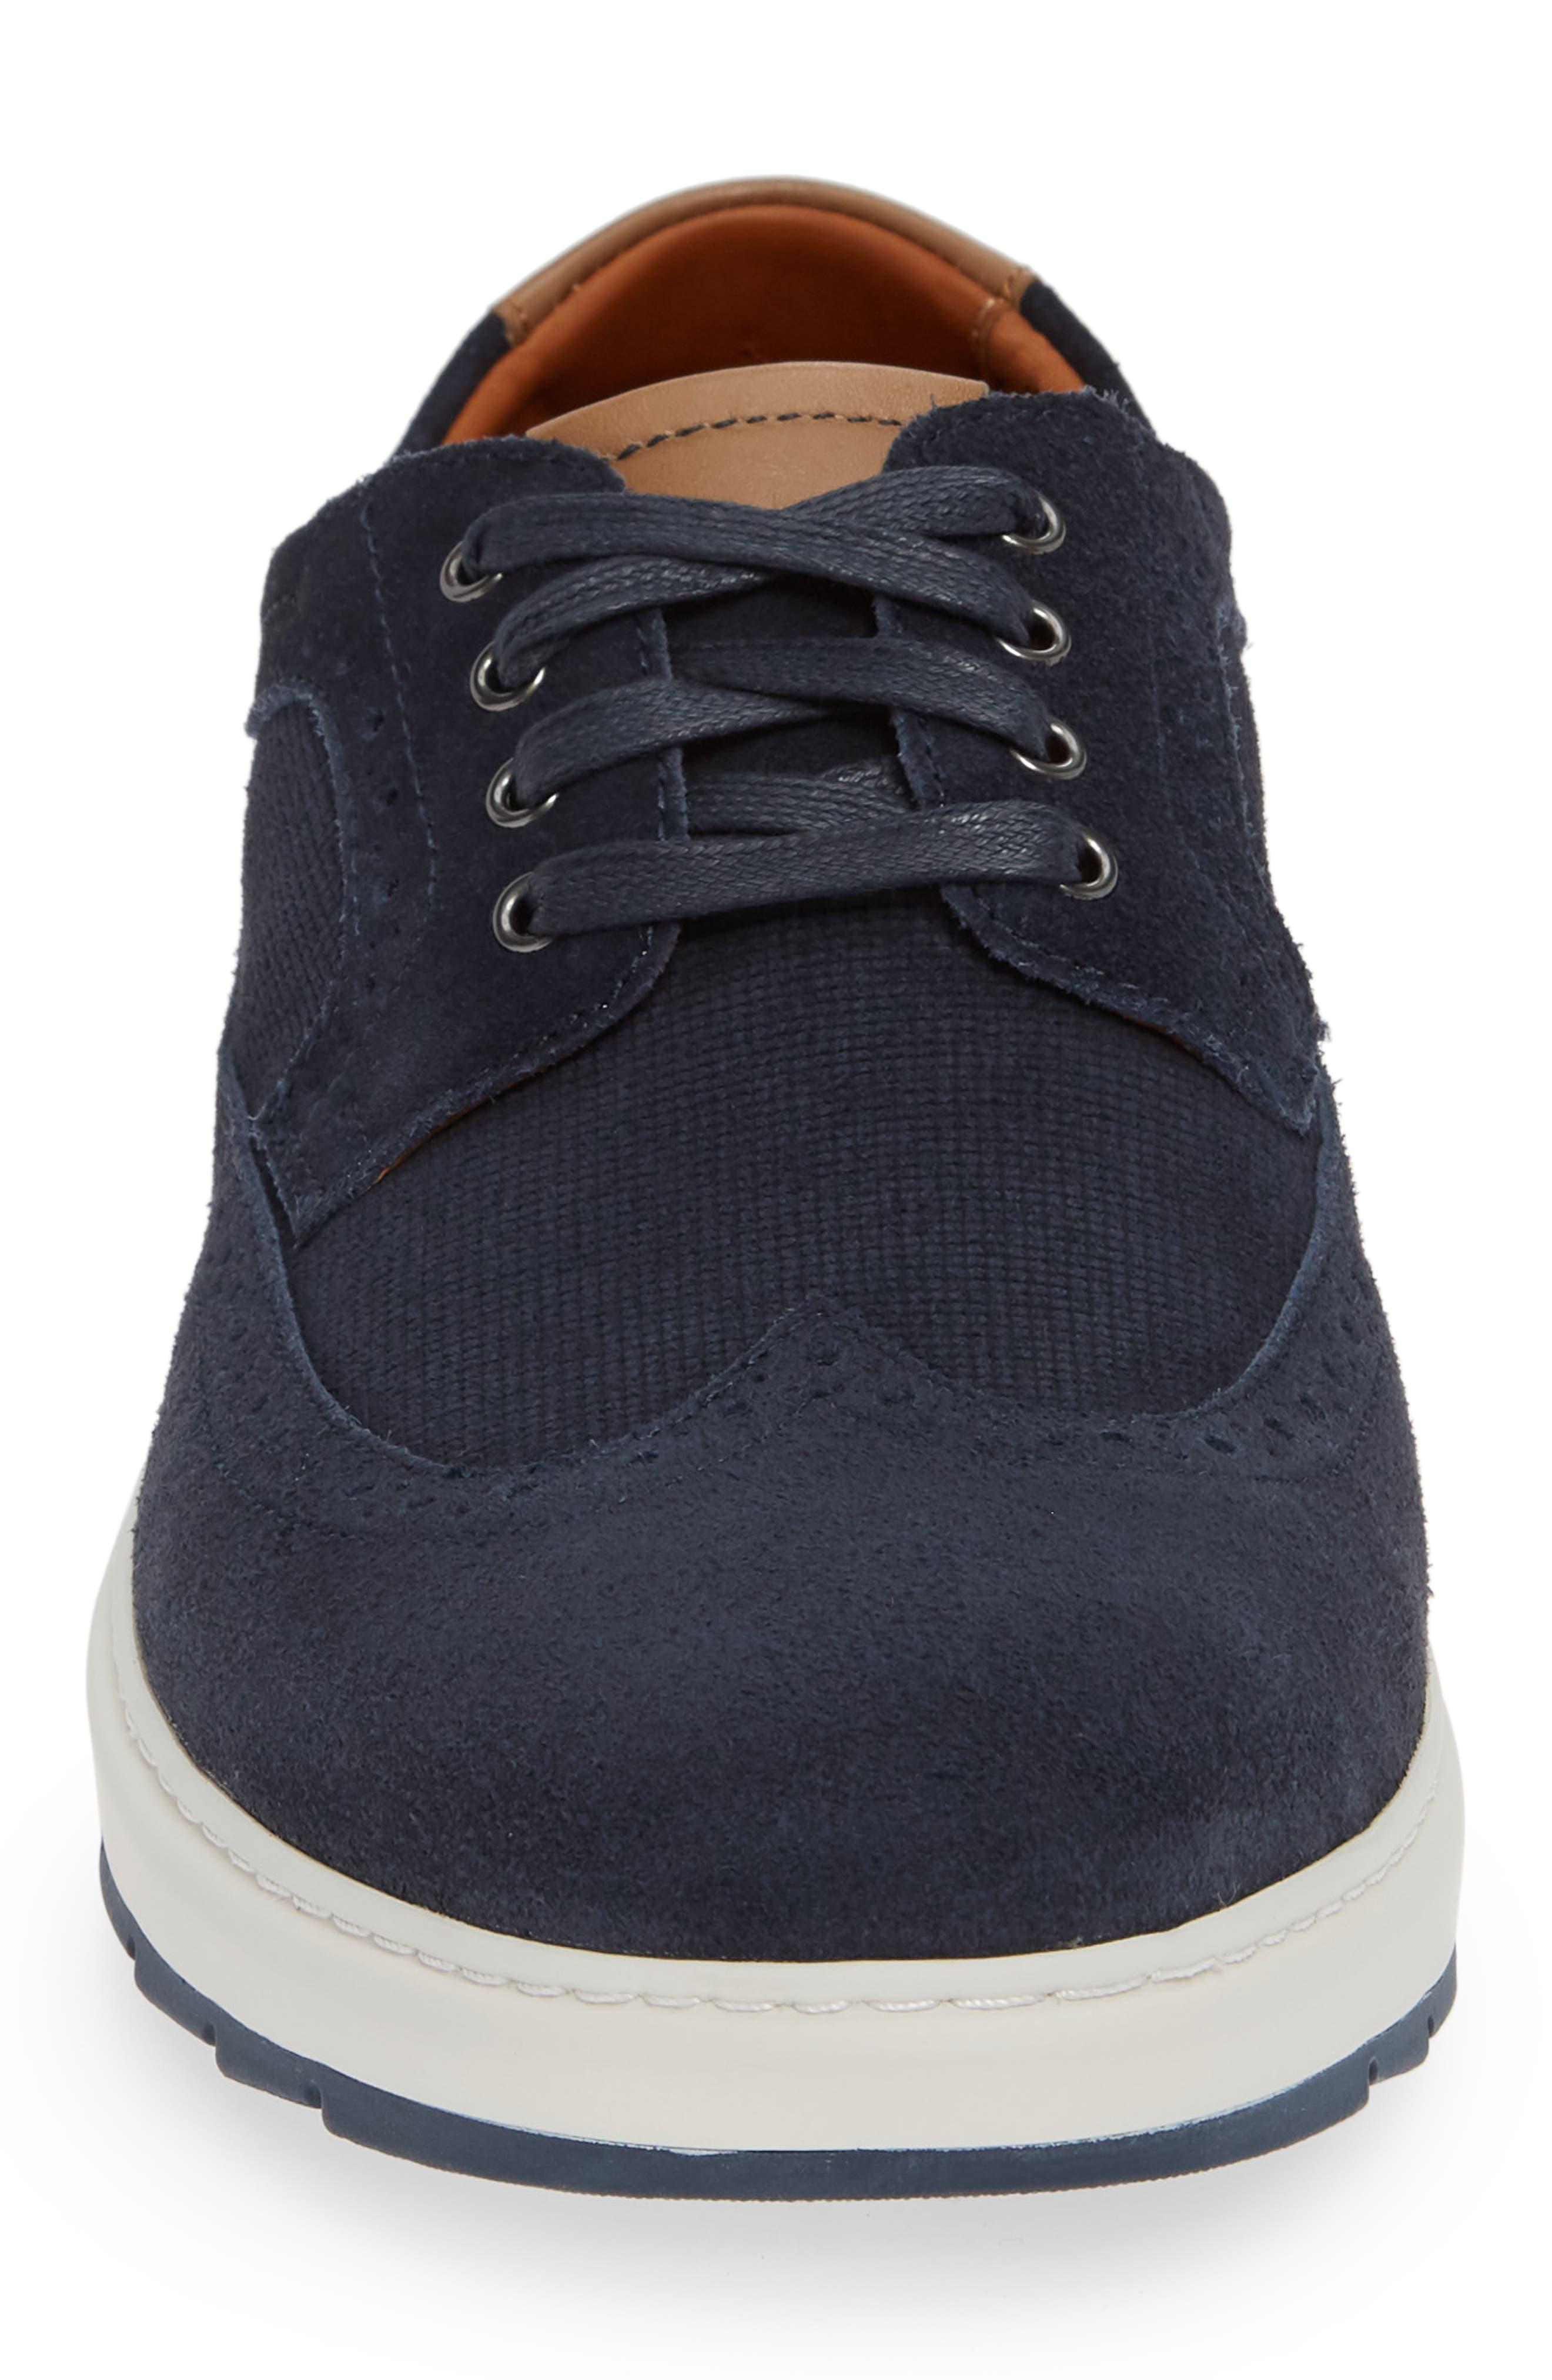 Elliston Wingtip Sneaker,                             Alternate thumbnail 4, color,                             NAVY SUEDE